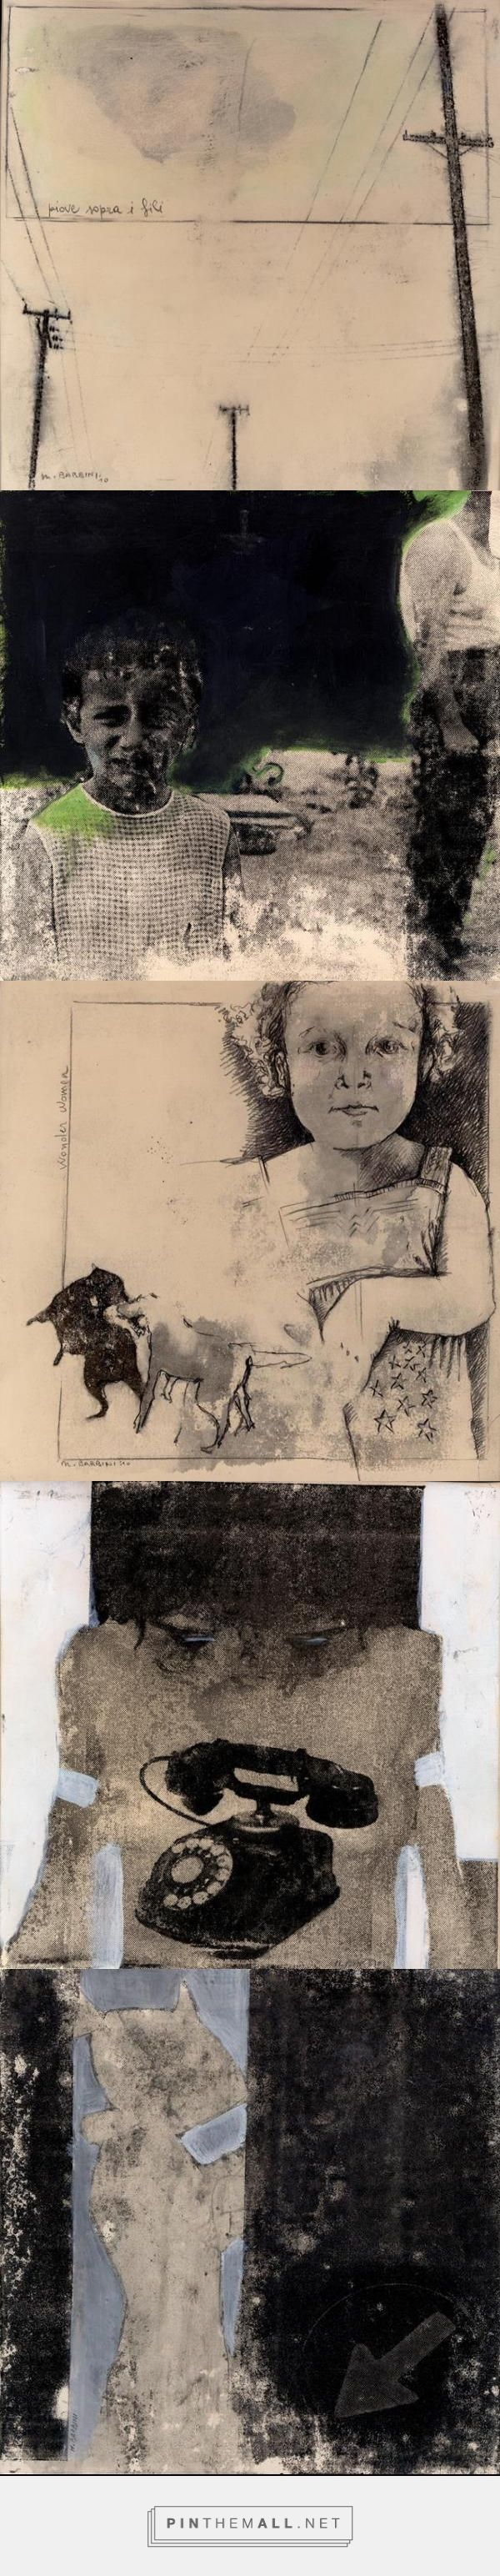 """the family tiles"" Massimo Barbini - created via http://pinthemall.net"